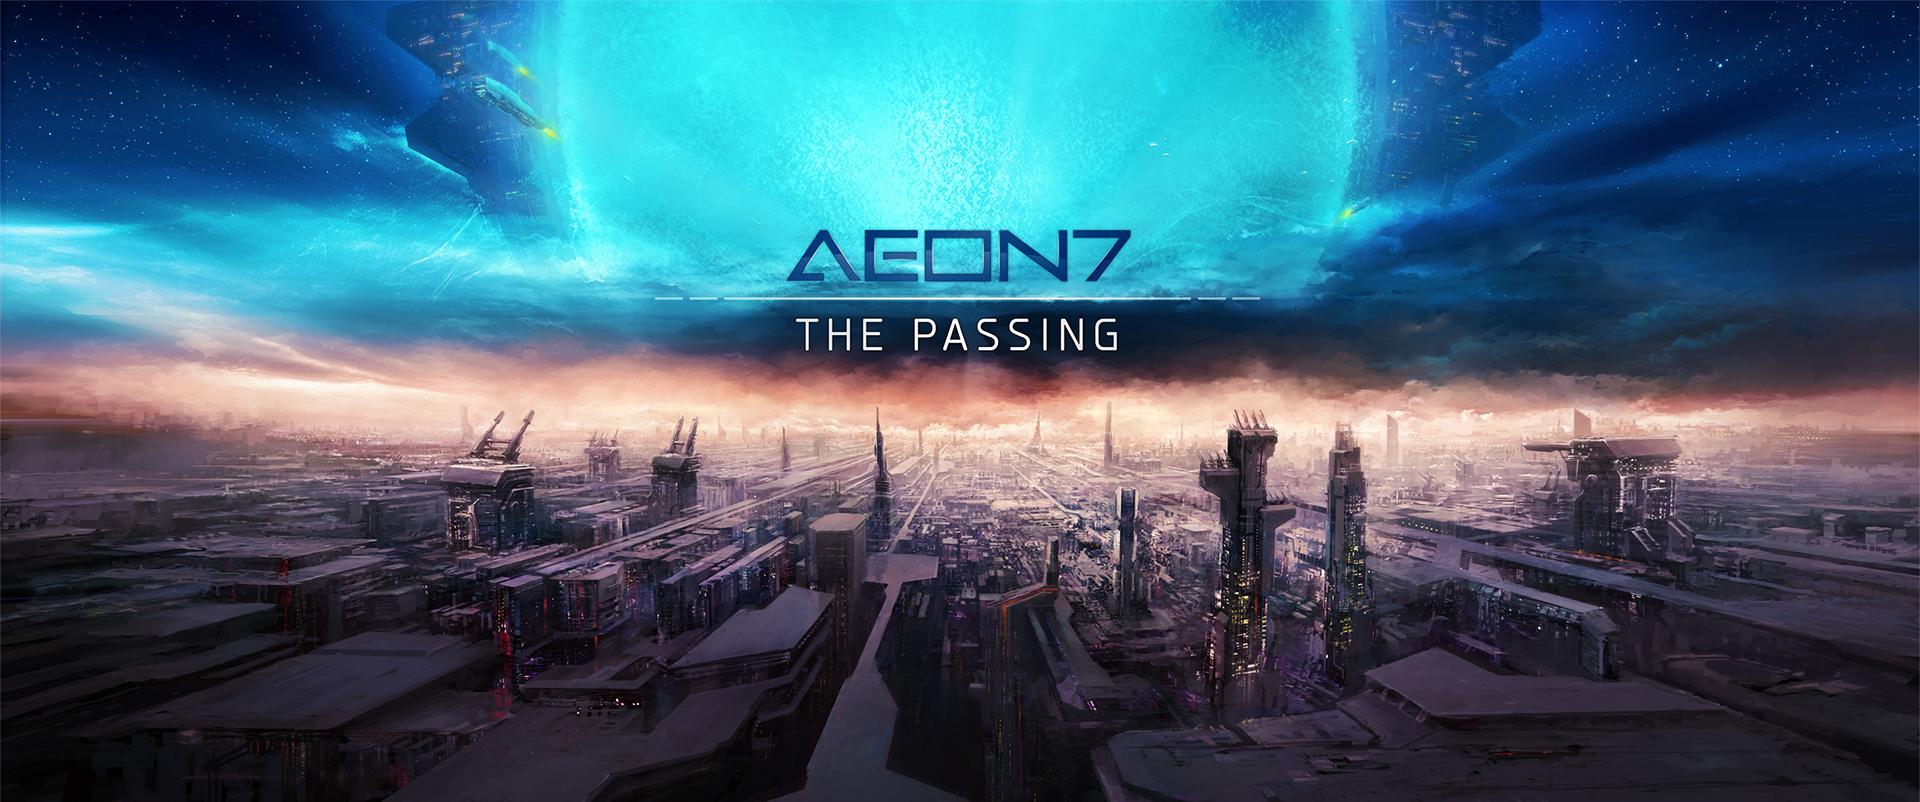 AEON7 - The Passing [Website artwork] by zilekondic